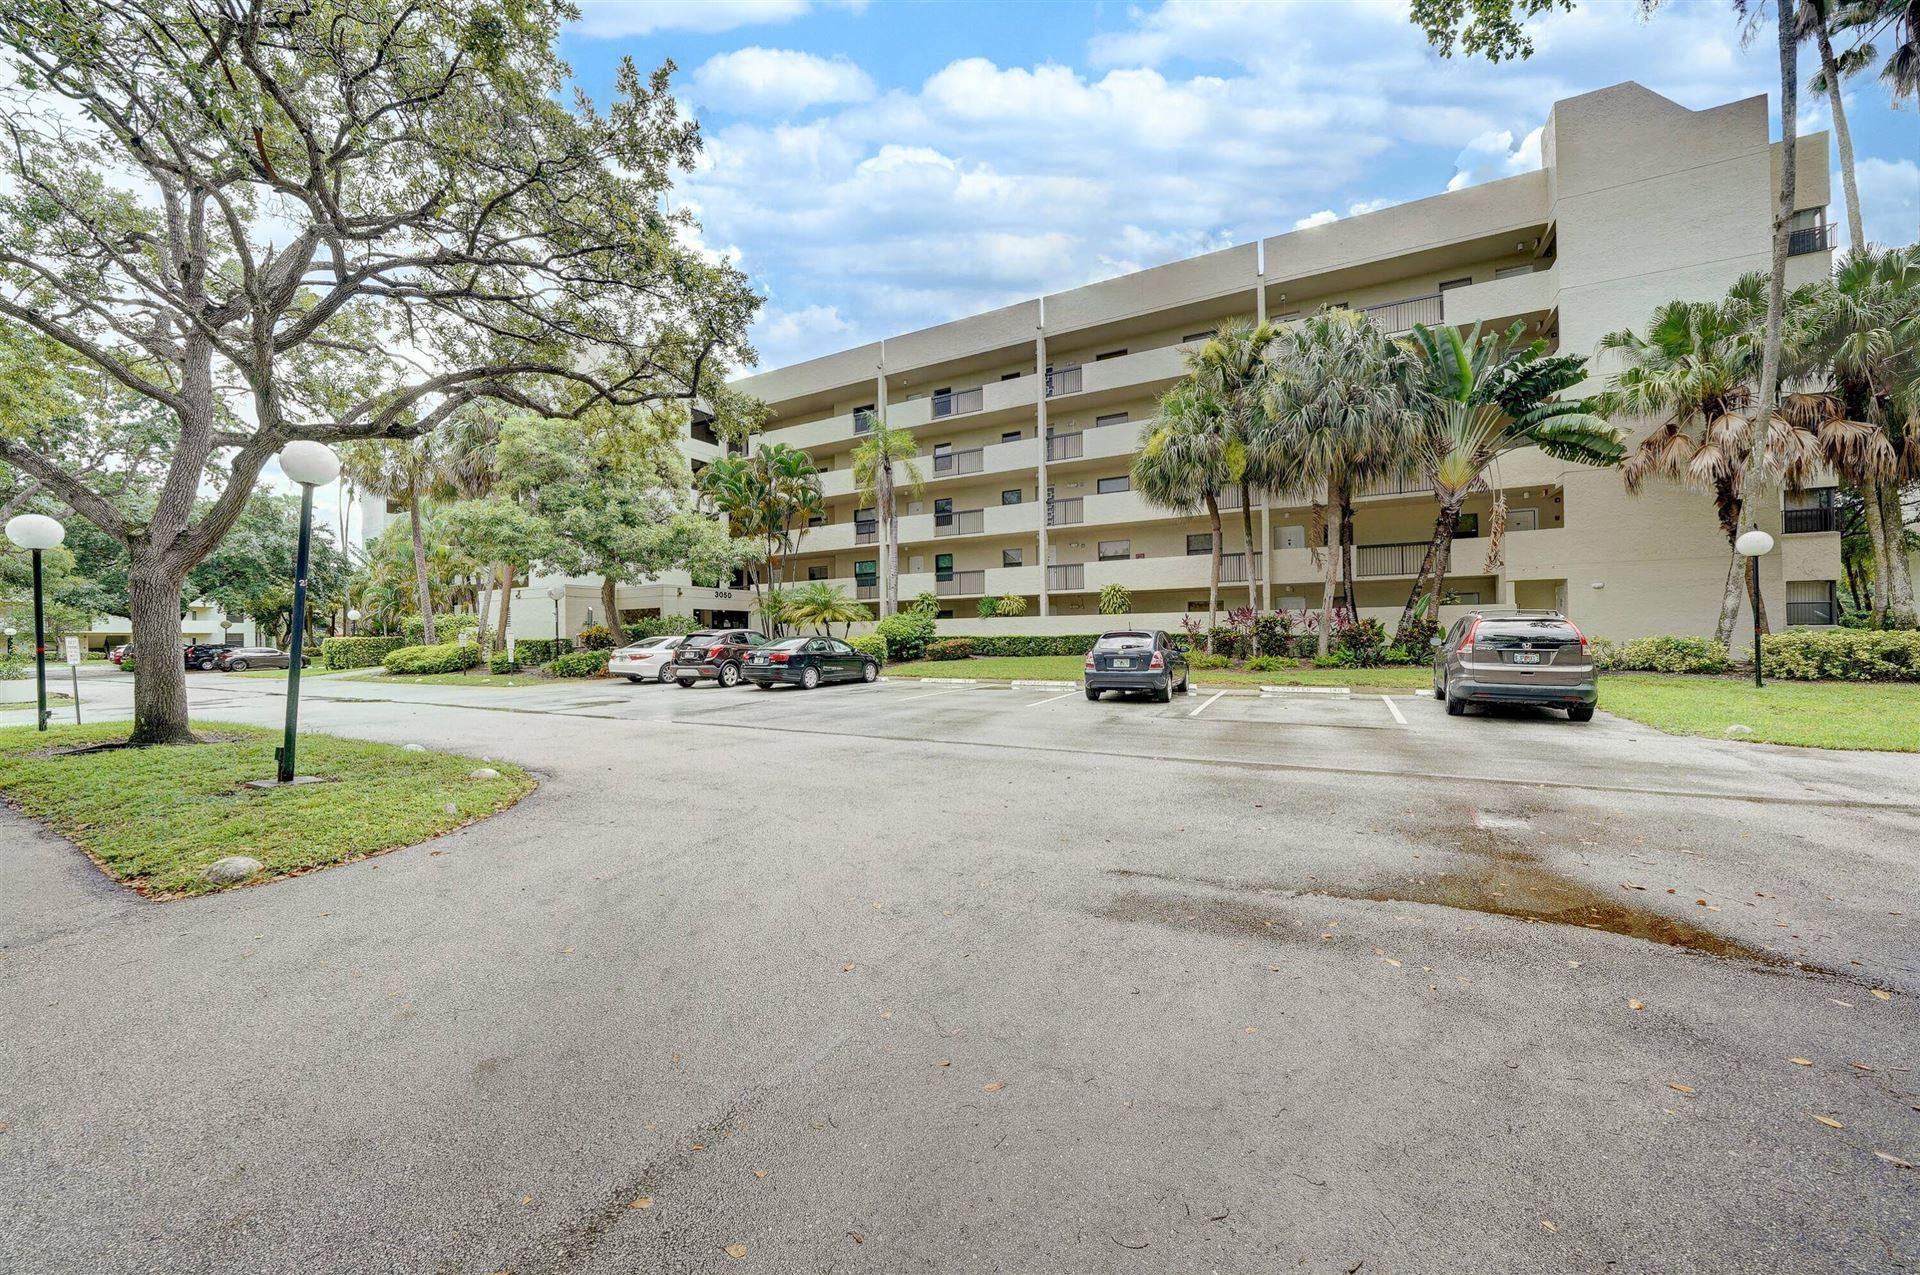 Photo of 3050 NW 42nd Avenue #C 403, Coconut Creek, FL 33066 (MLS # RX-10733276)